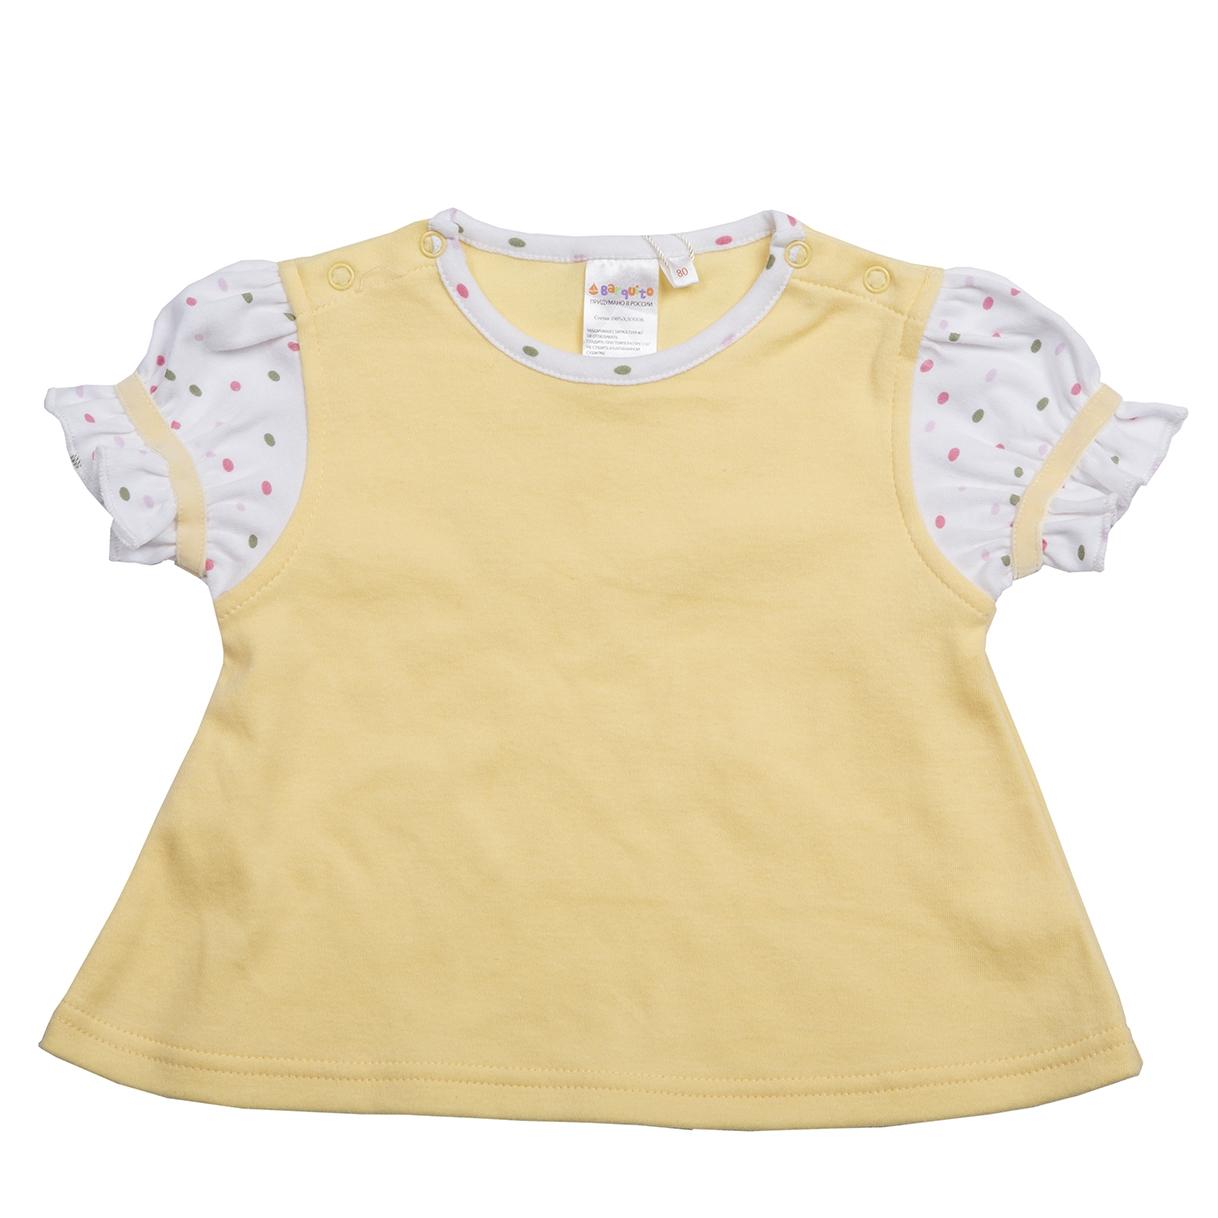 Футболки и топы BARQUITO Футболка Кролик с коротким рукавом для девочки Barquito желтый футболки и топы coccodrillo футболка cute cat w18143202cut